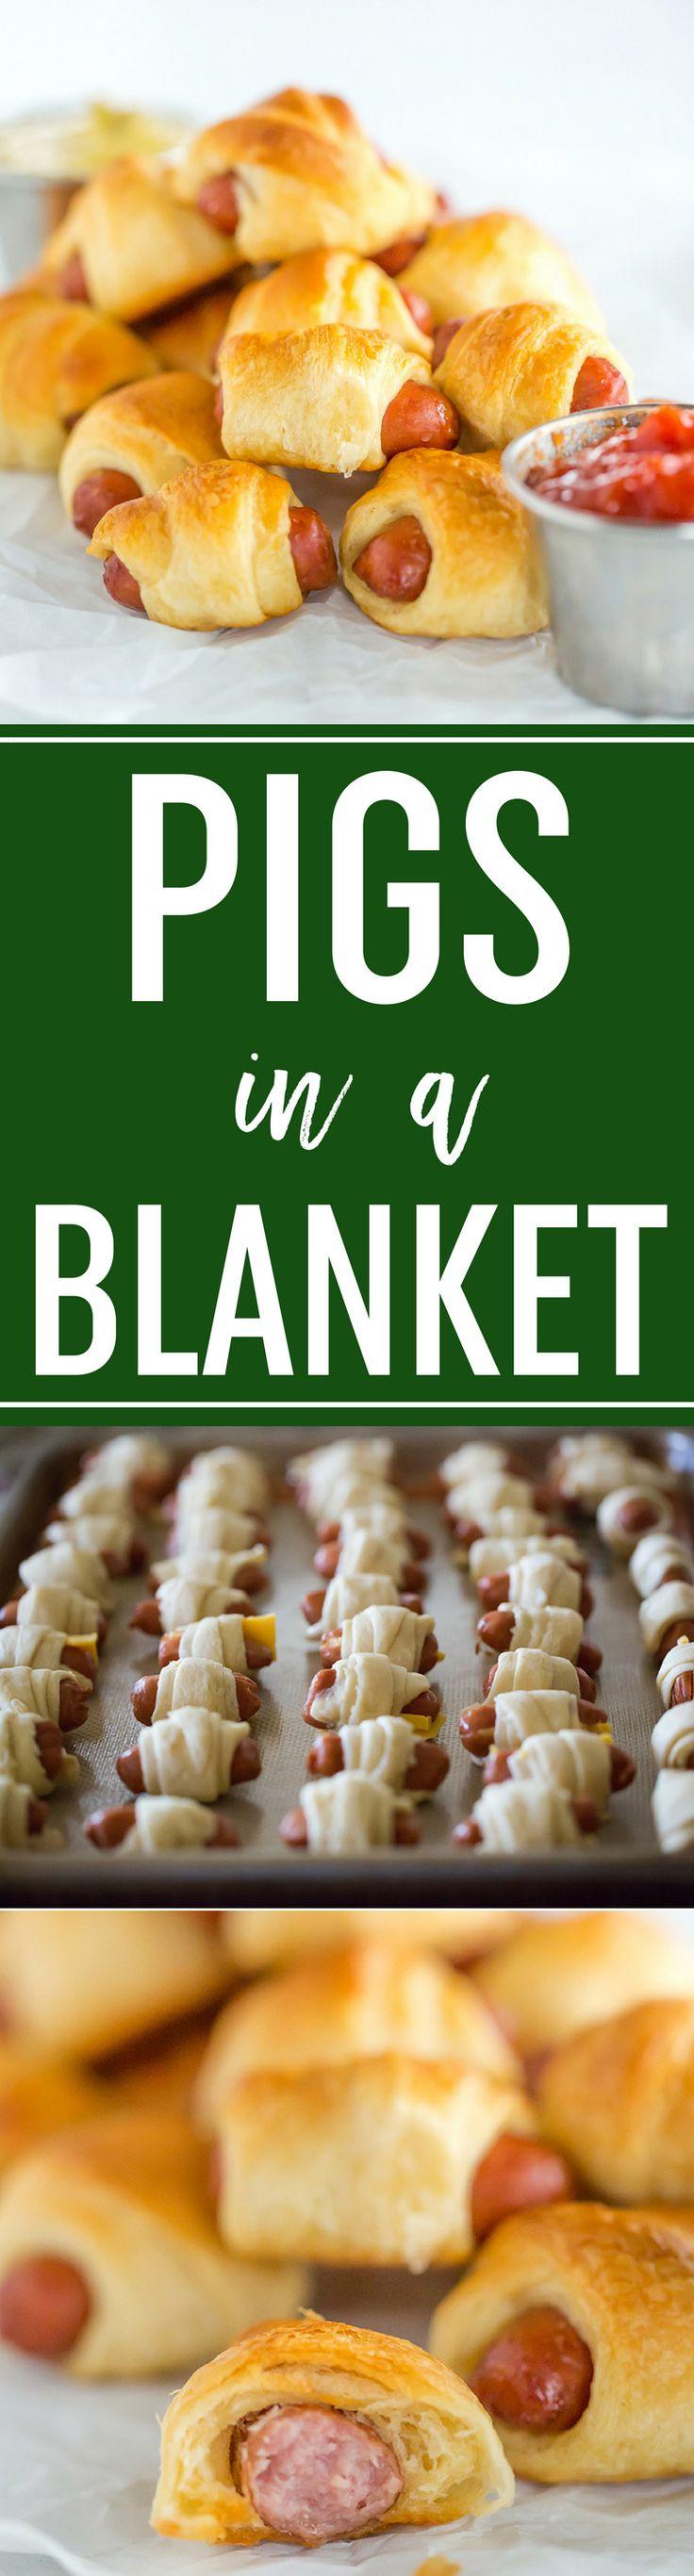 Lil Smokie Pigs in a Blanket